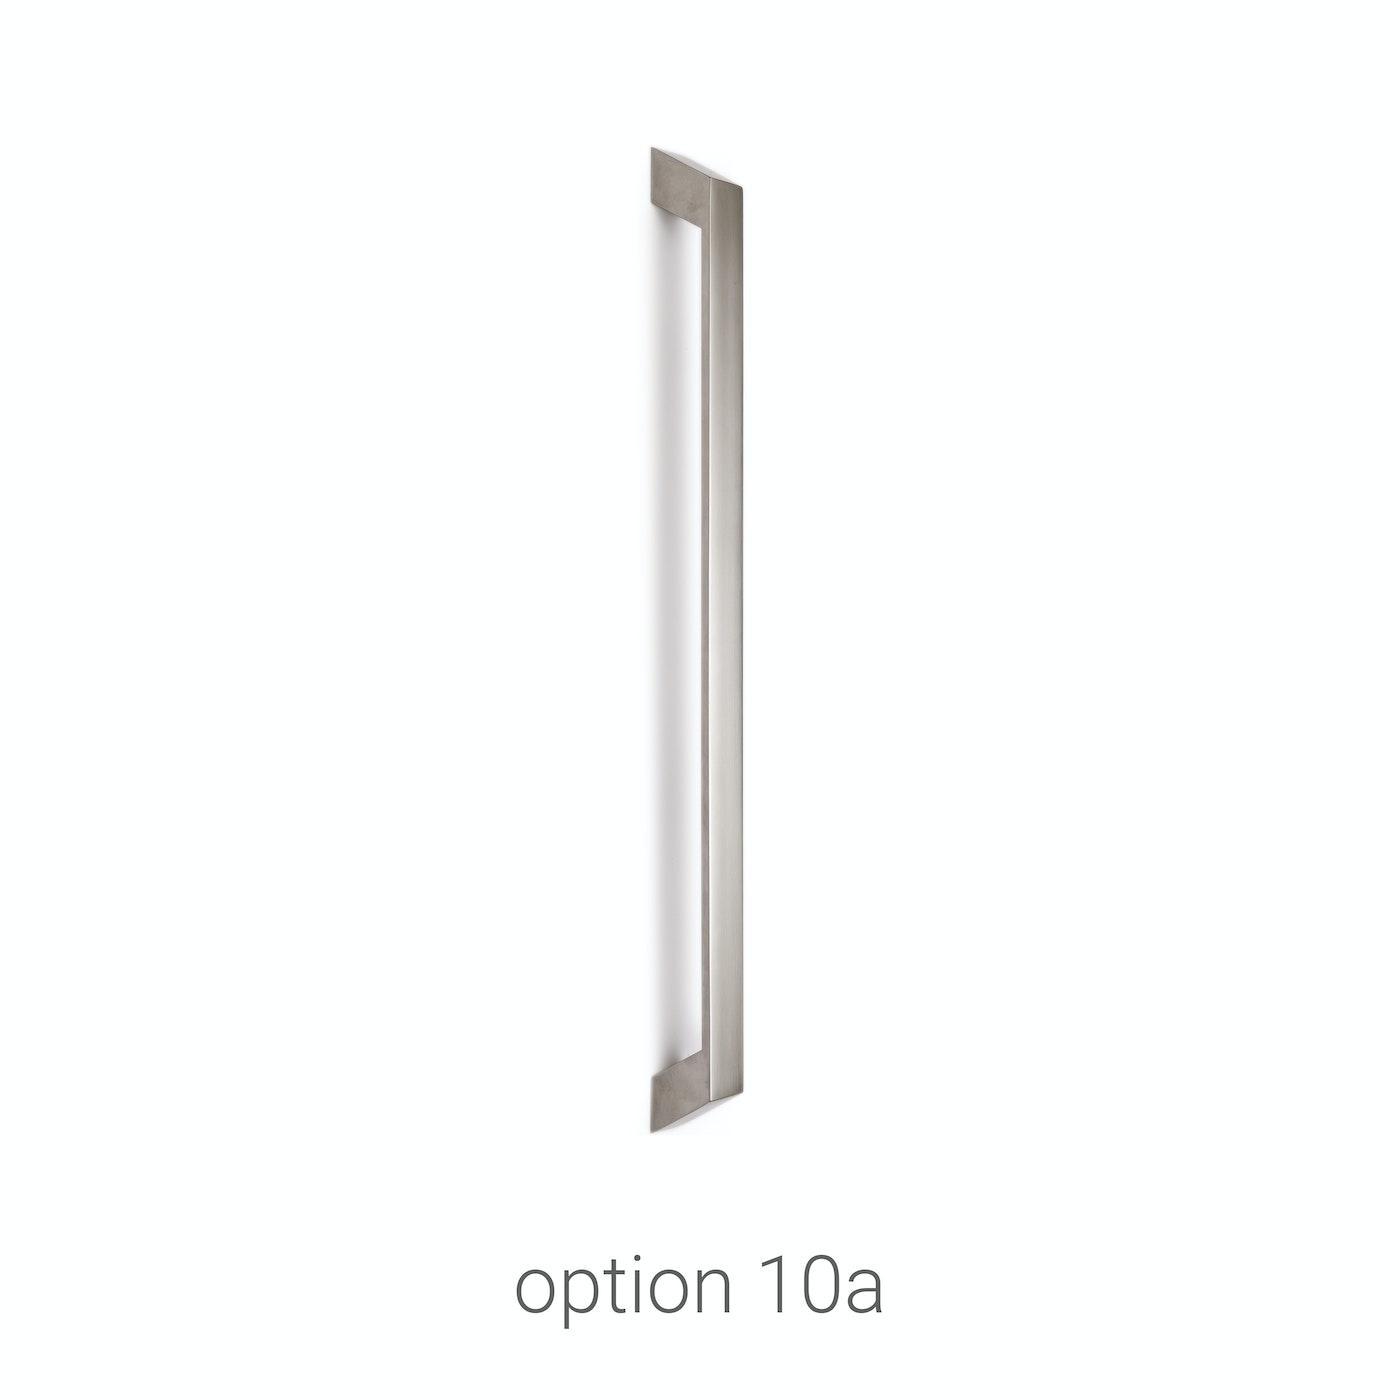 handles stainless steel door Urban Front option 10a